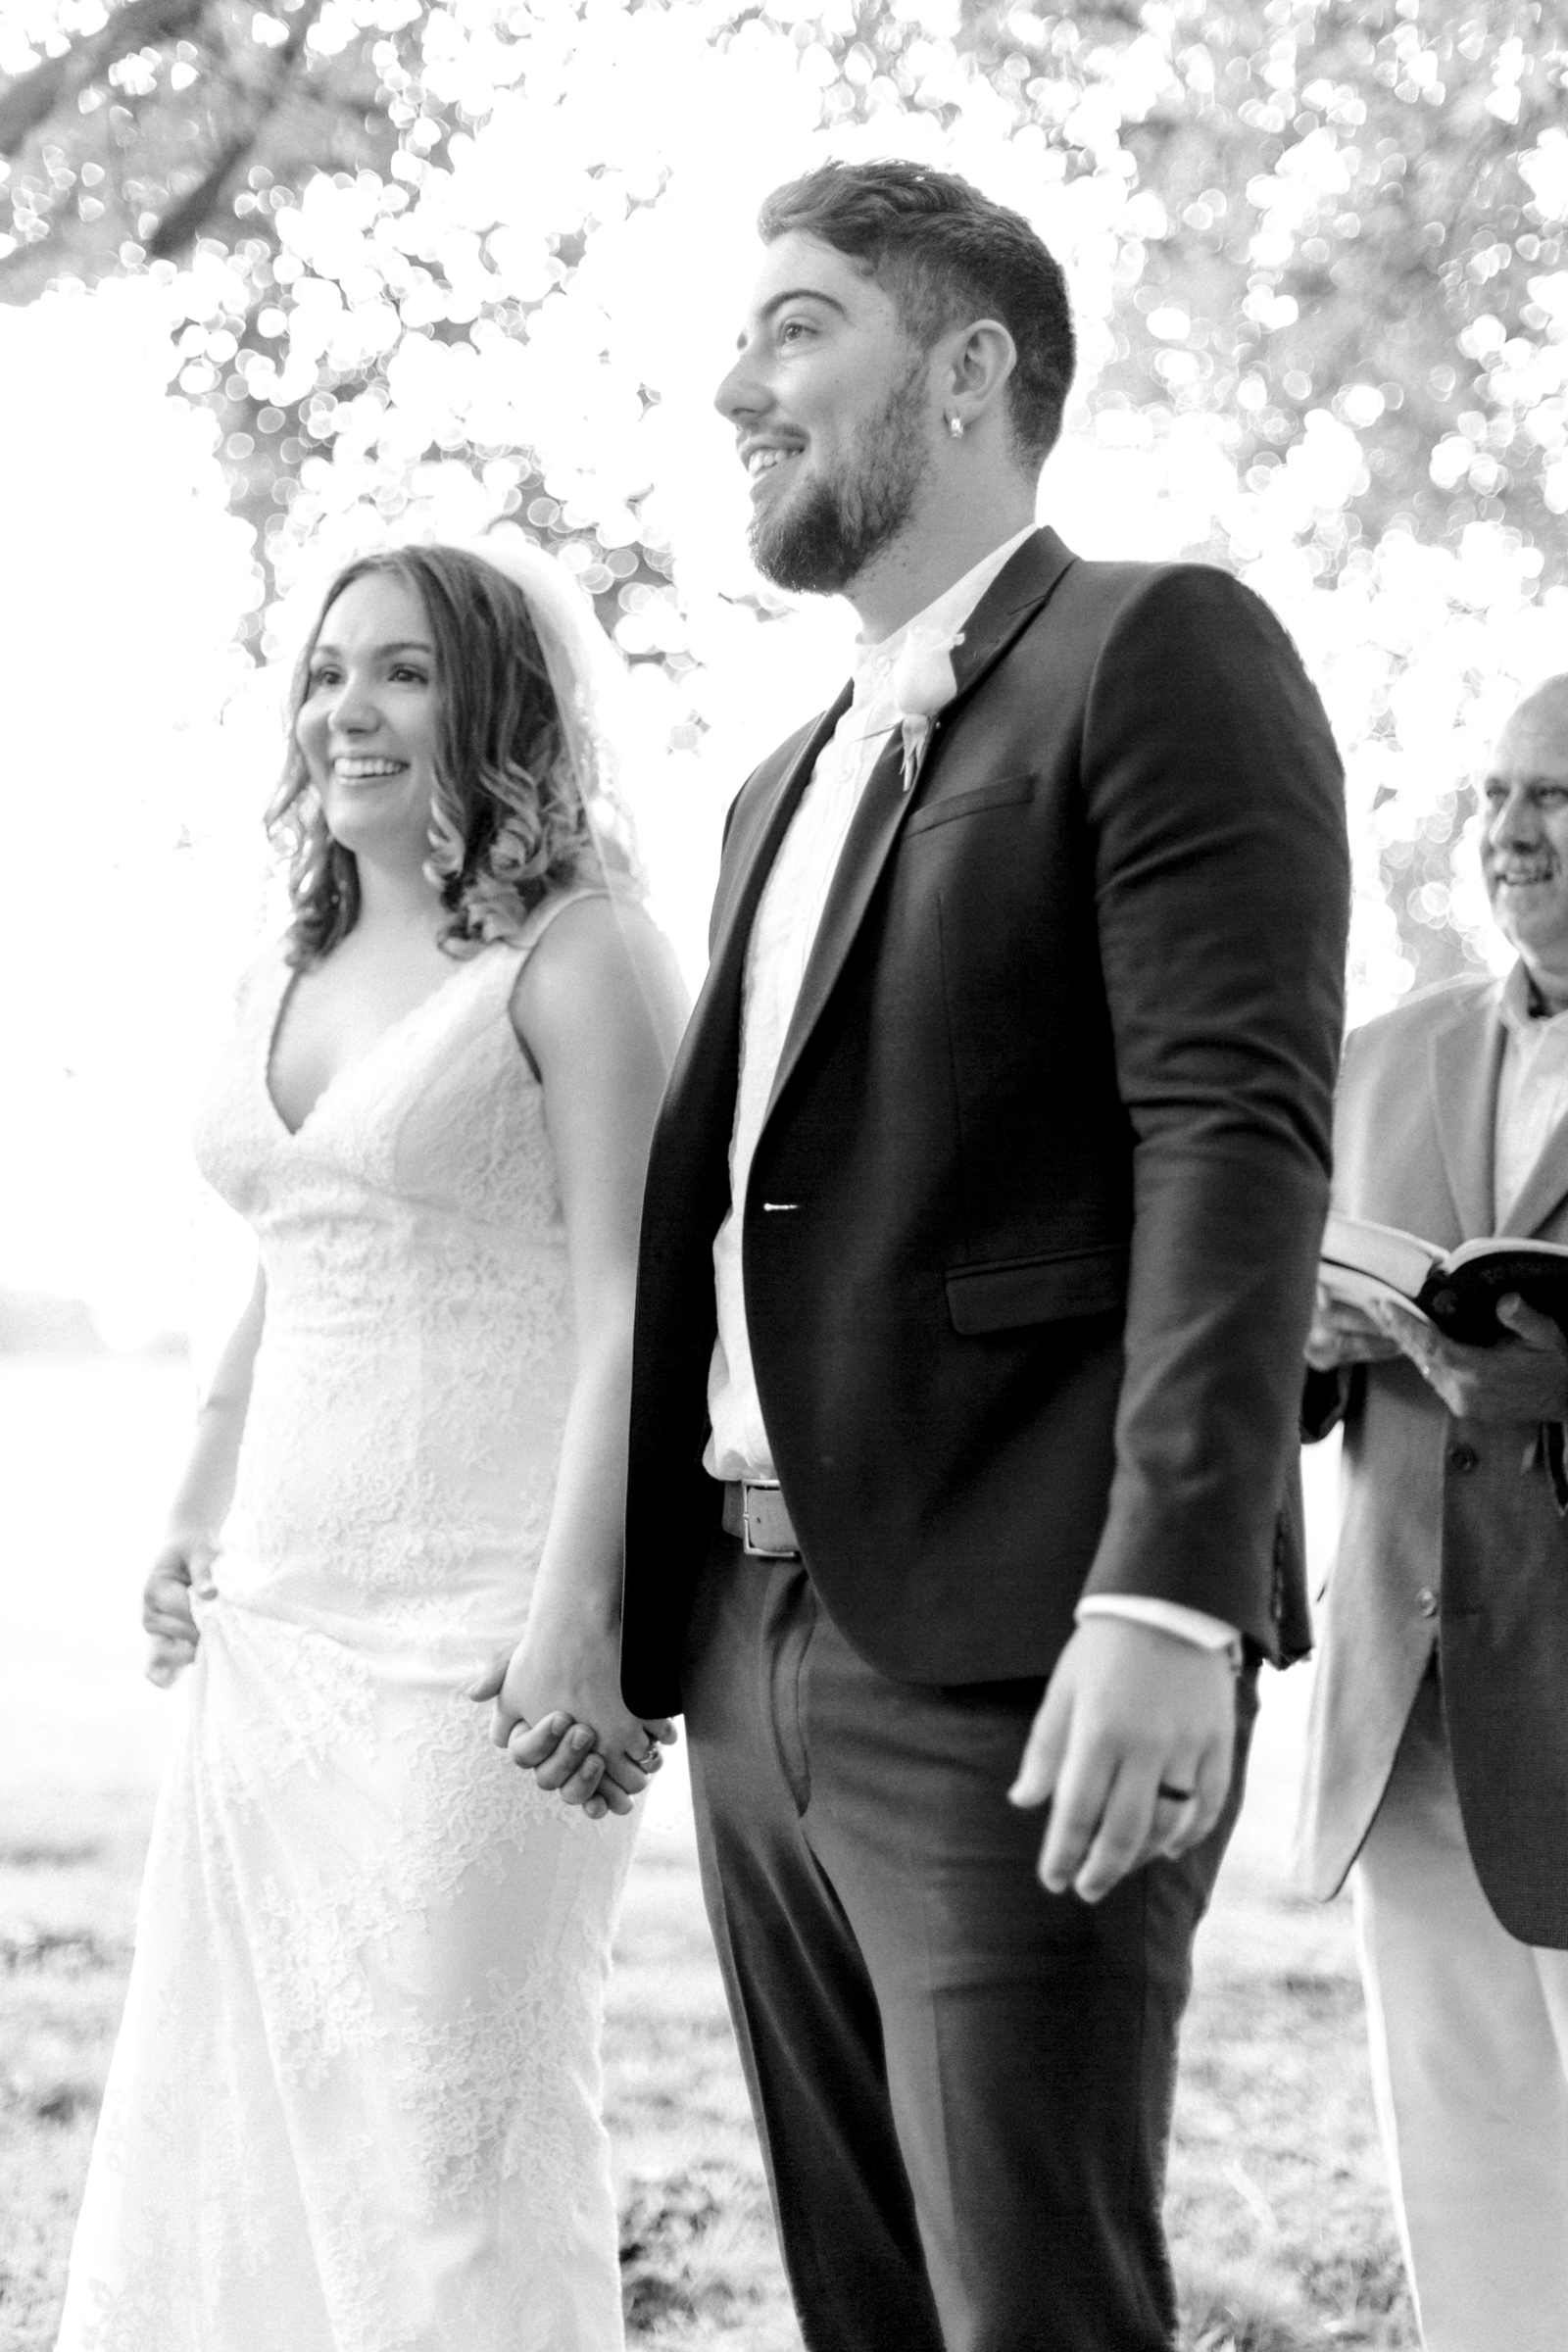 Jessica Sgubin Photography Wedding Engagement Couples Family Atlanta Decatur Marietta Kennesaw Stone Mountain Photographer-19.jpg